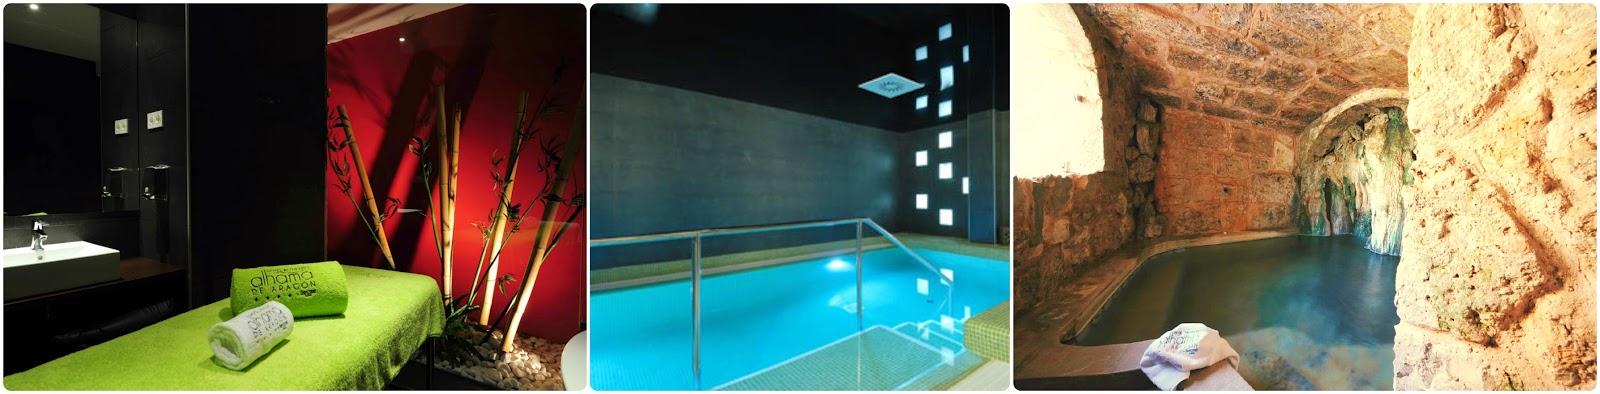 Sercotel Hotel Balneario Alhama de Aragón